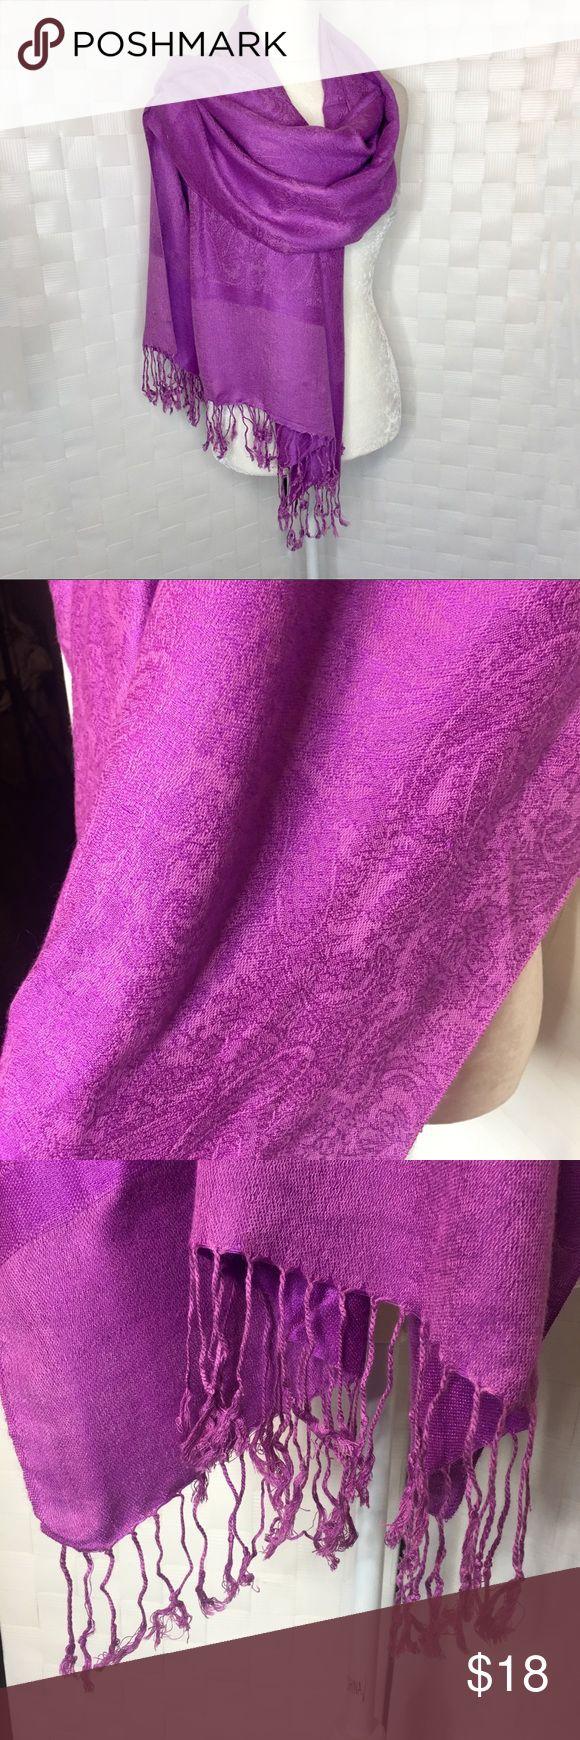 Pashmina Paisley Scarf Deep Lavendar colored paisley print scarf that's 70% Pashmina and 30% Silk. Accessories Scarves & Wraps